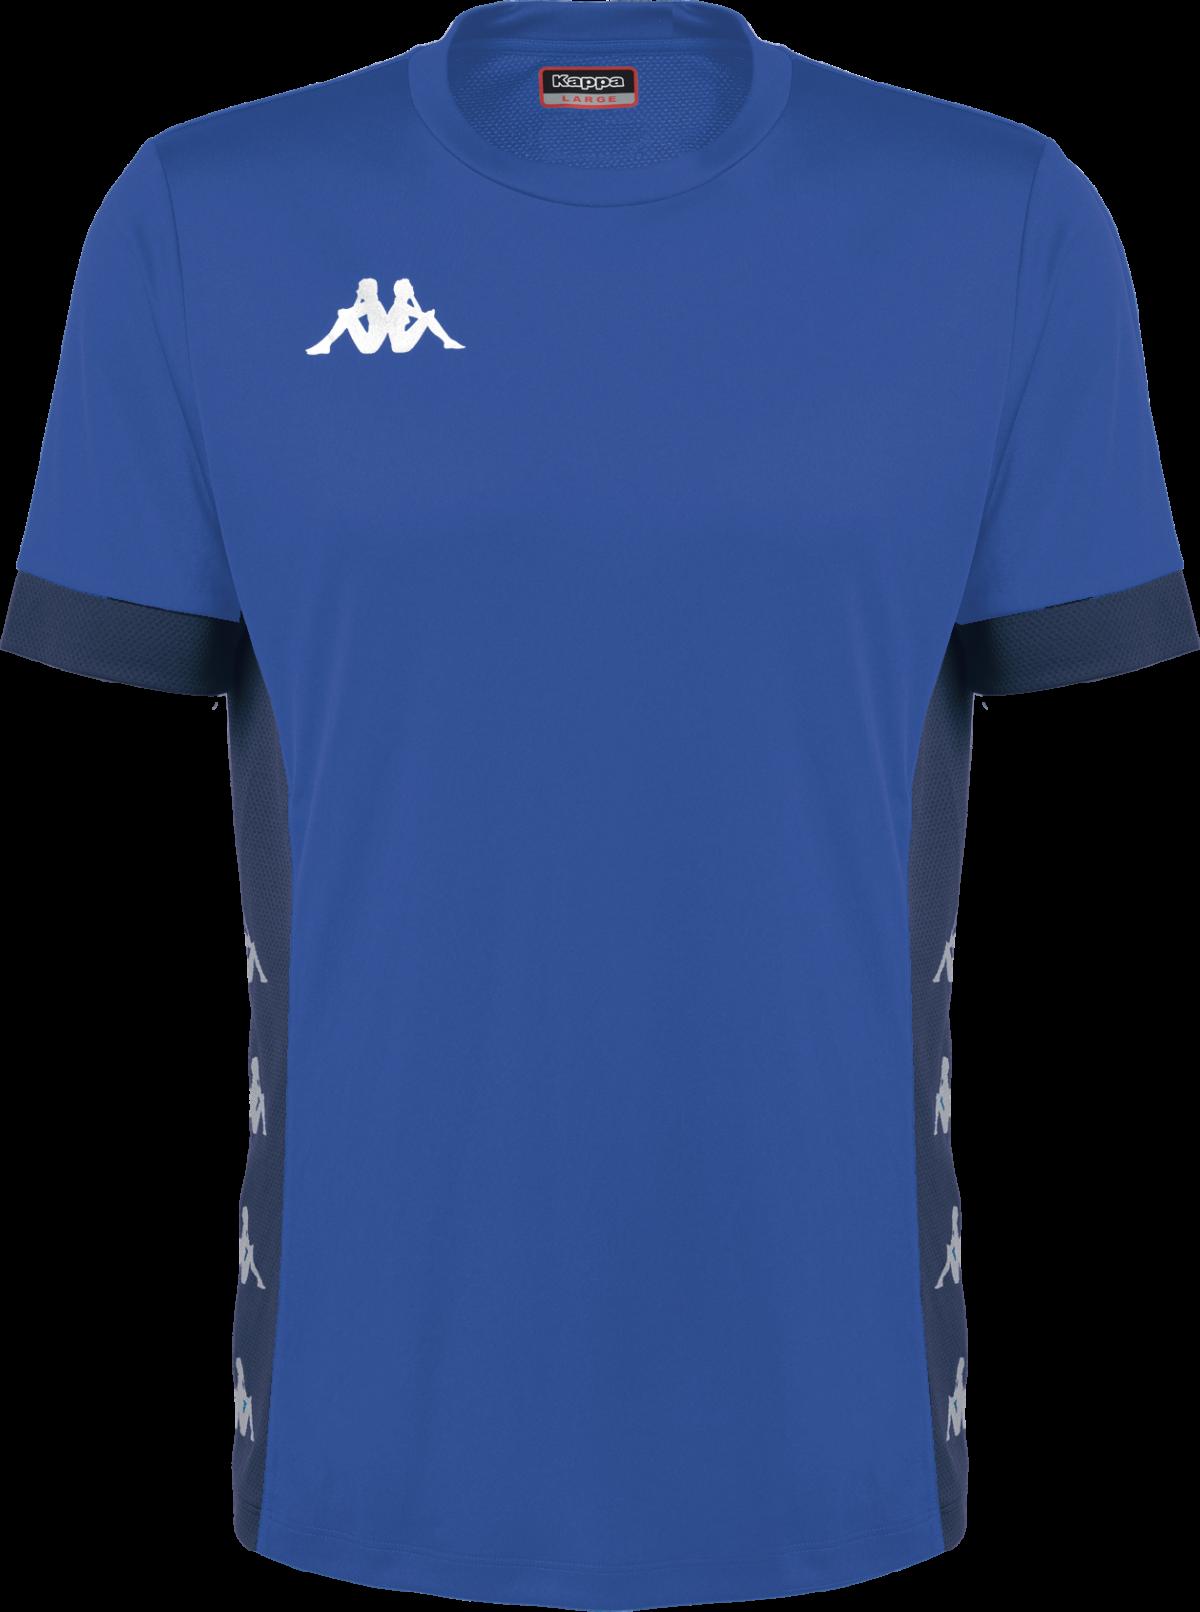 Kappa DERVIO Adult Handball Match Shirt SS - 31152PW